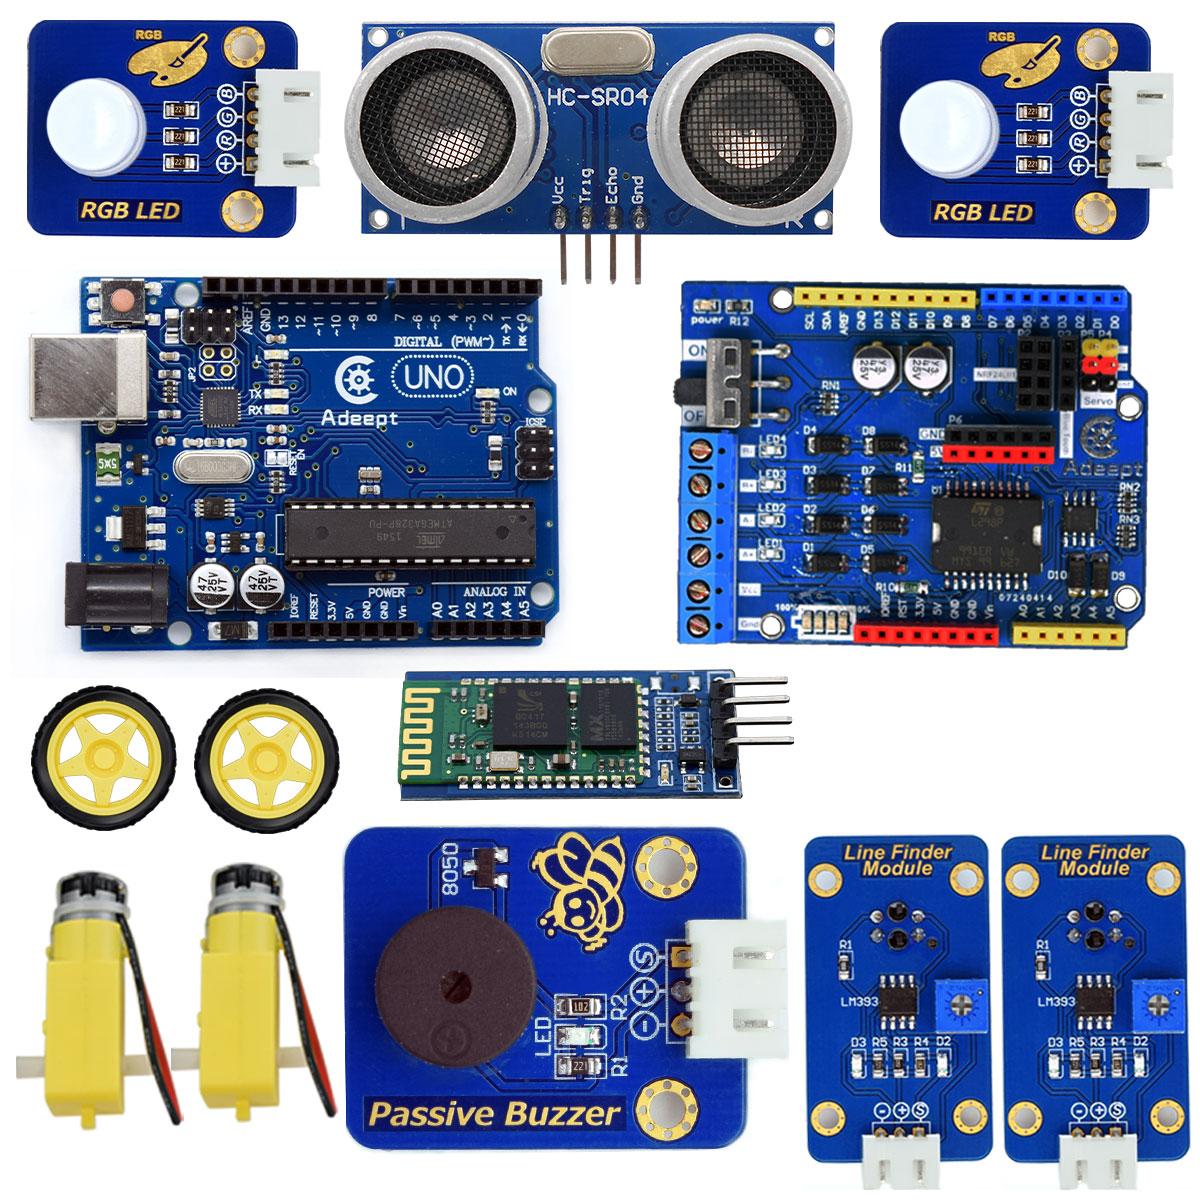 Adeept wd bluetooth smart robot car kit for arduino uno